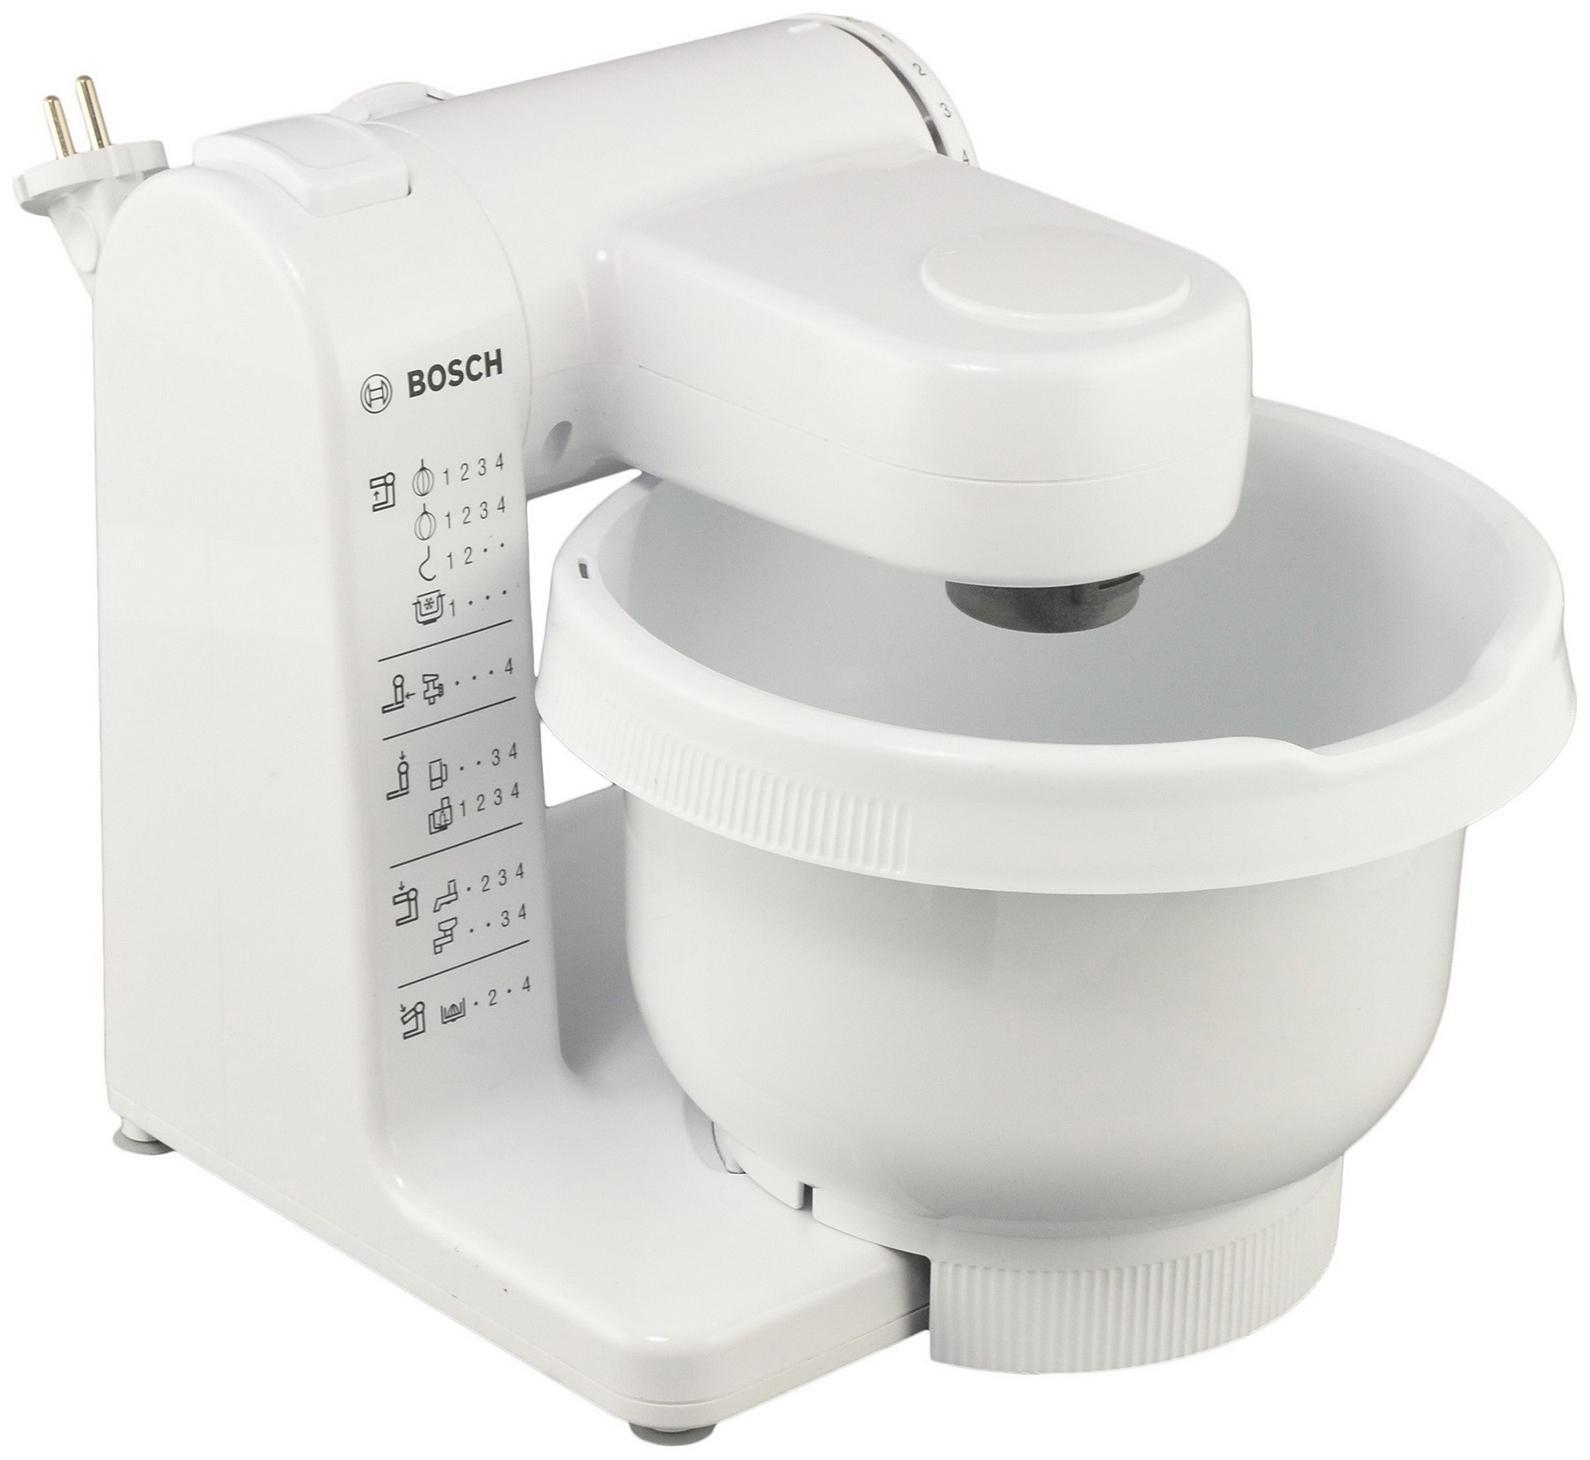 Bosch MUM 4406MUM 4406